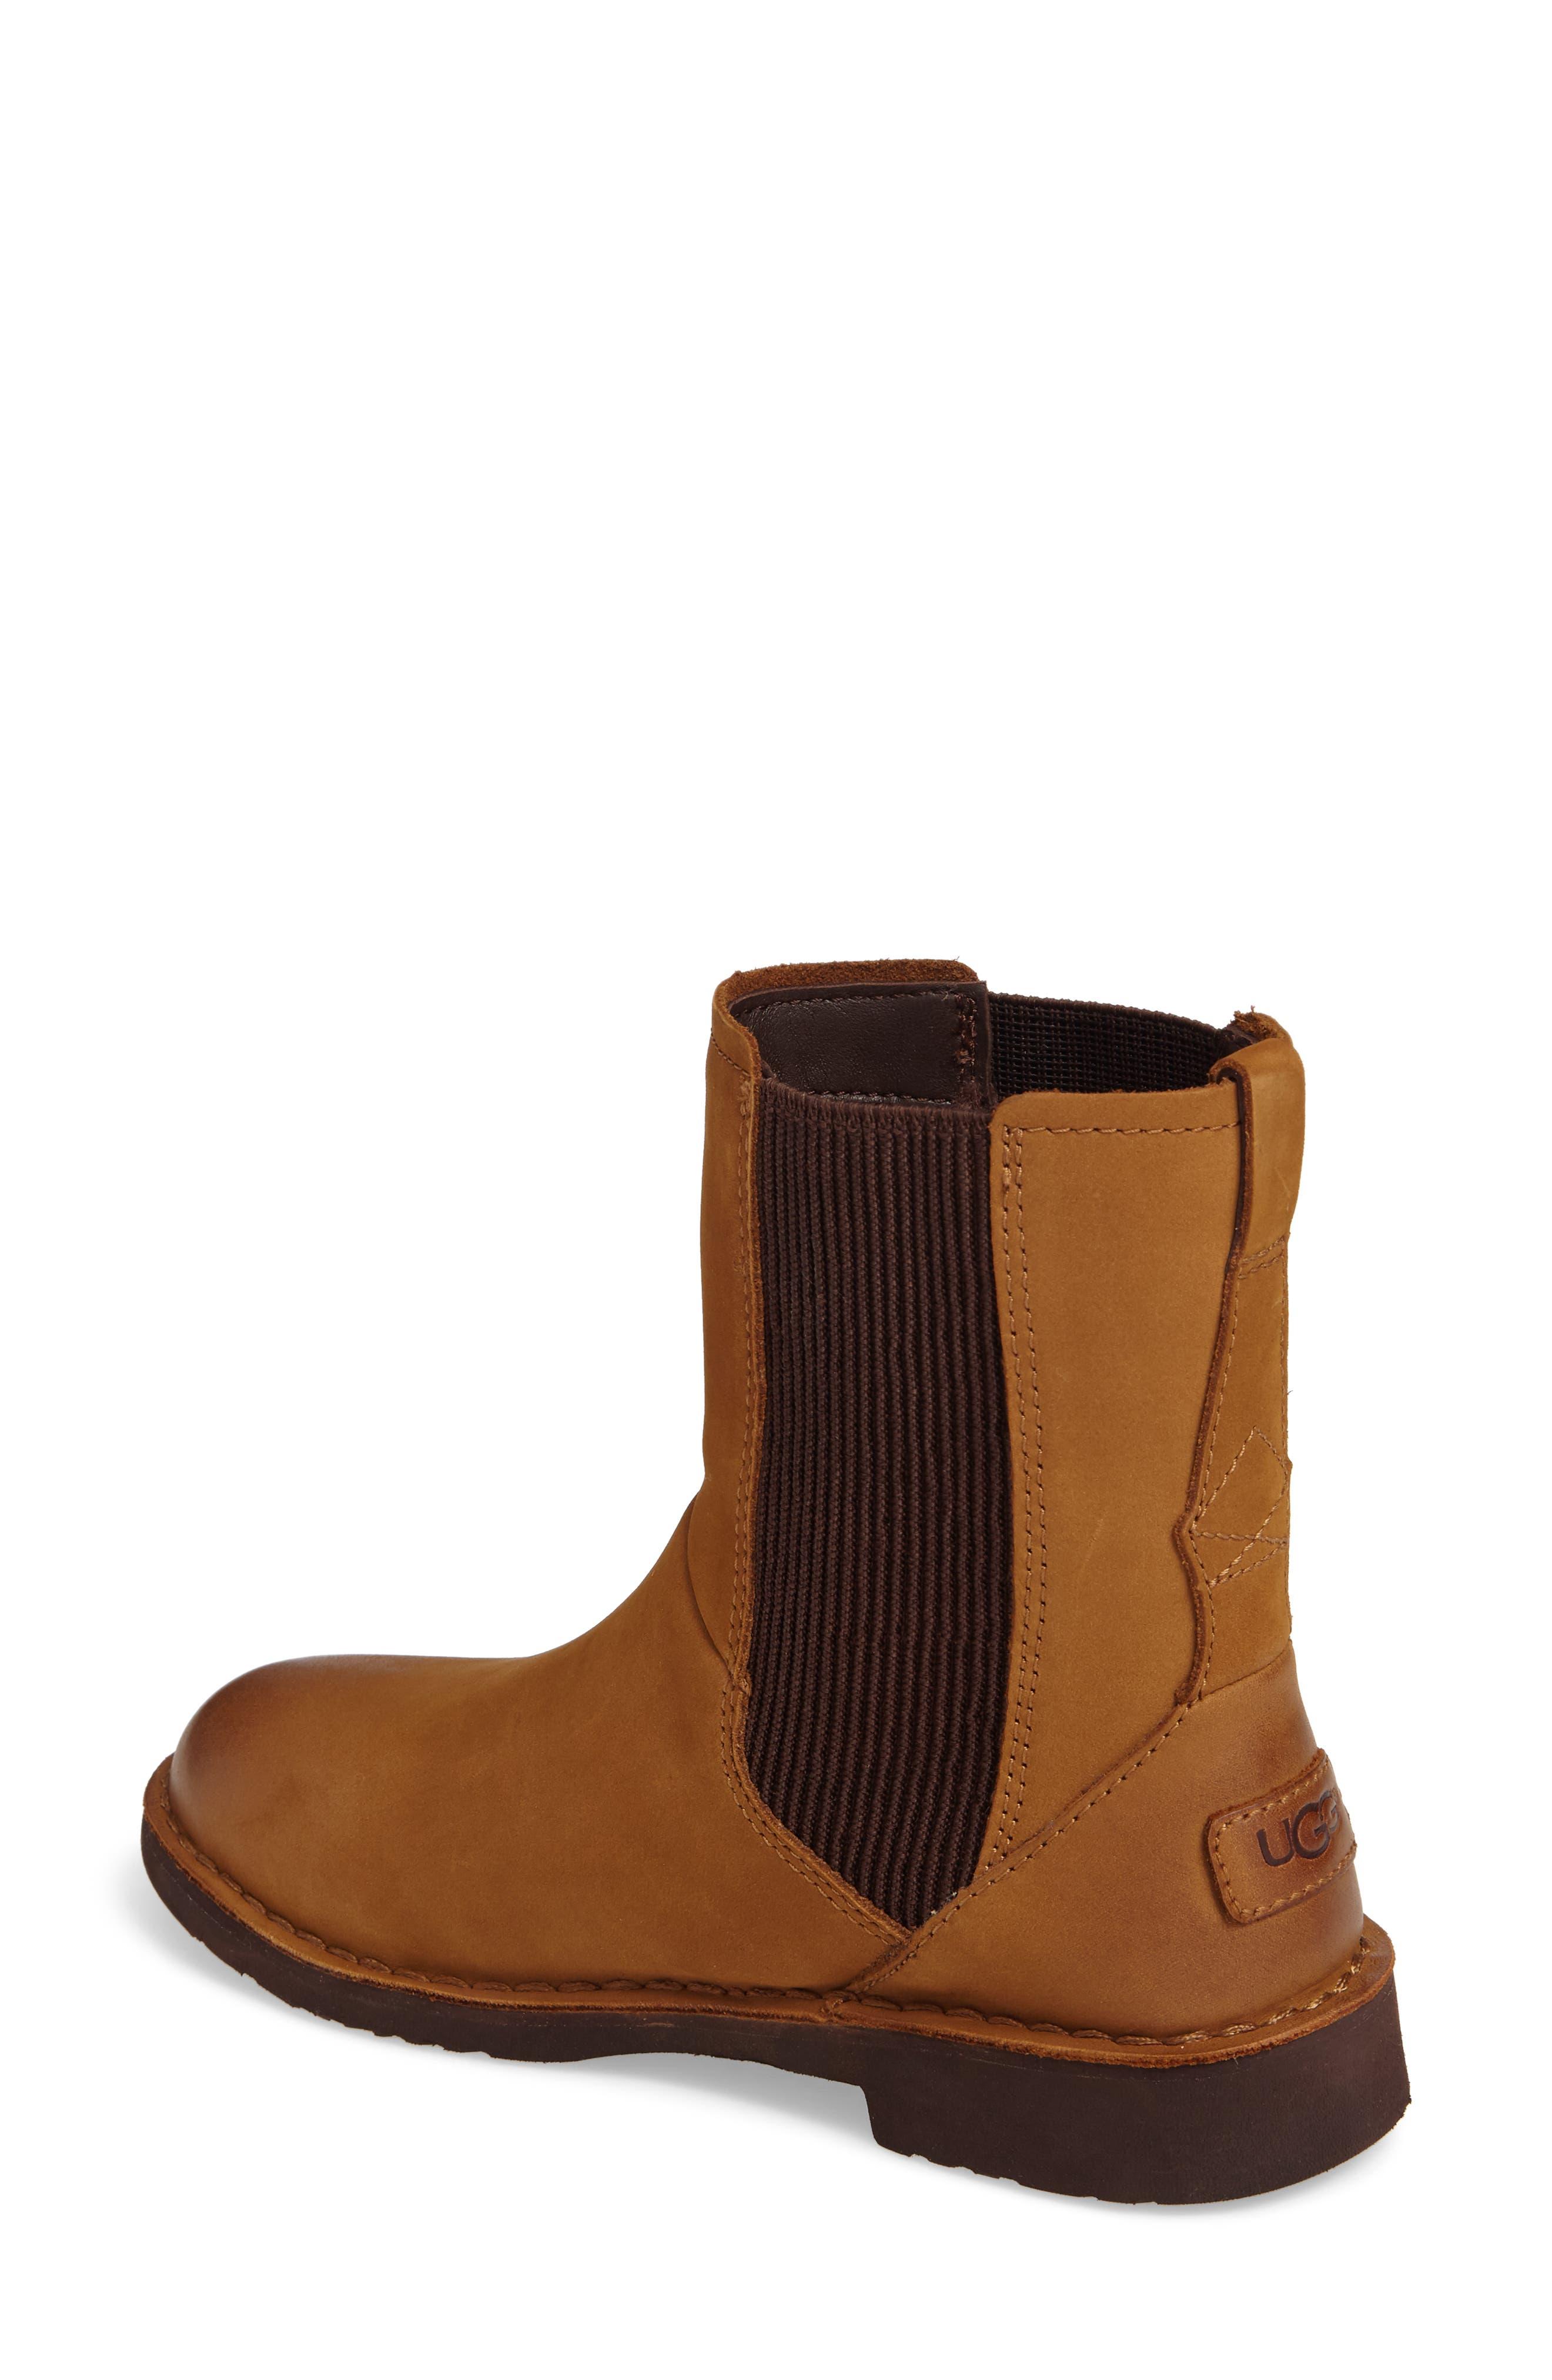 Larra Boot,                             Alternate thumbnail 2, color,                             Chestnut Nubuck Leather